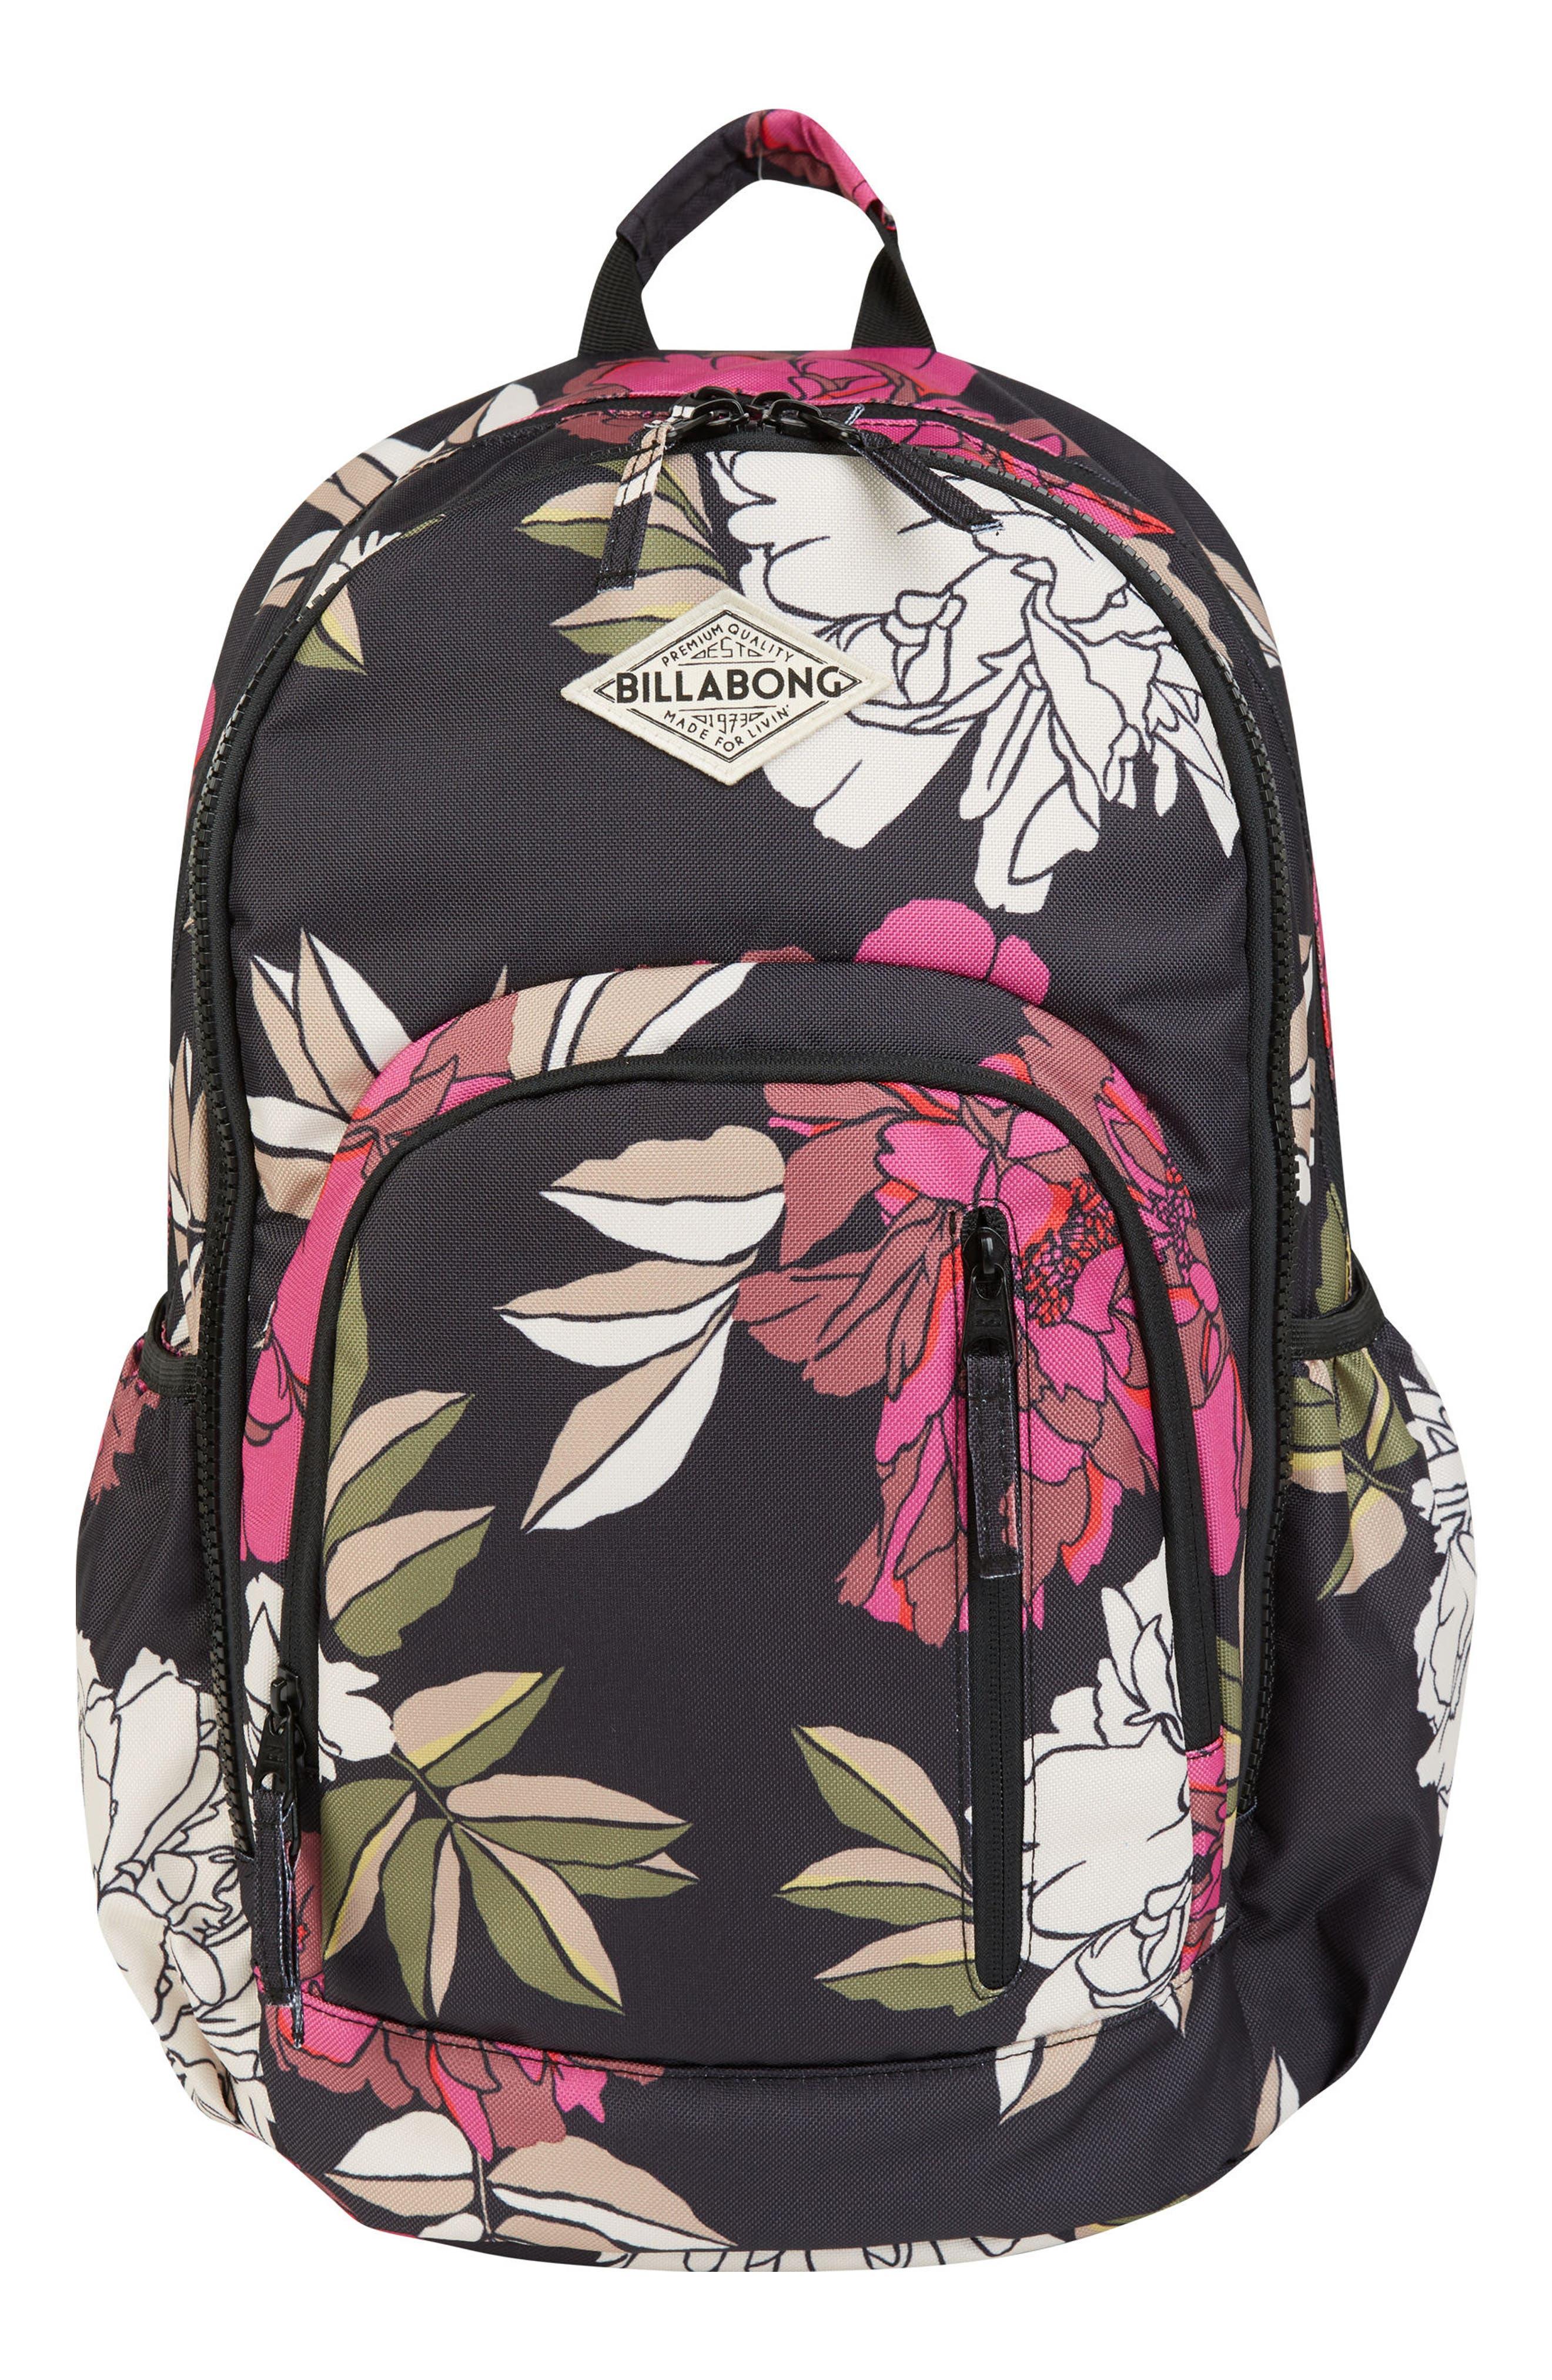 Roadie Backpack,                             Main thumbnail 1, color,                             Rebel Pink